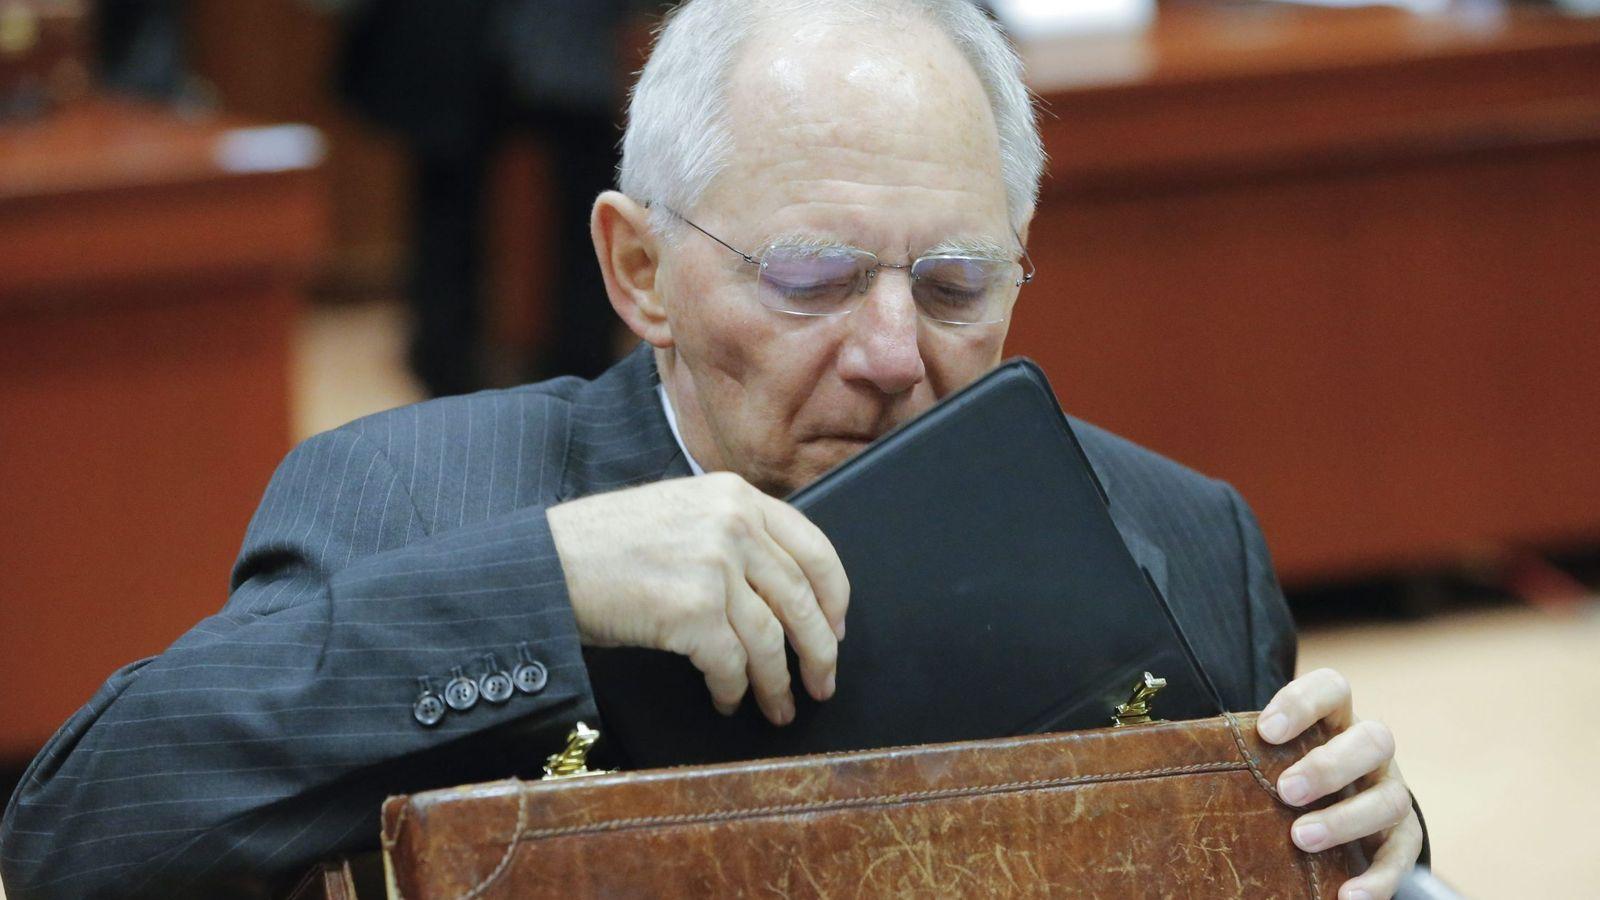 Foto: Wolfgang Schäuble, ministro de Finanzas alemán. (Ede/Olivier Hoslet)